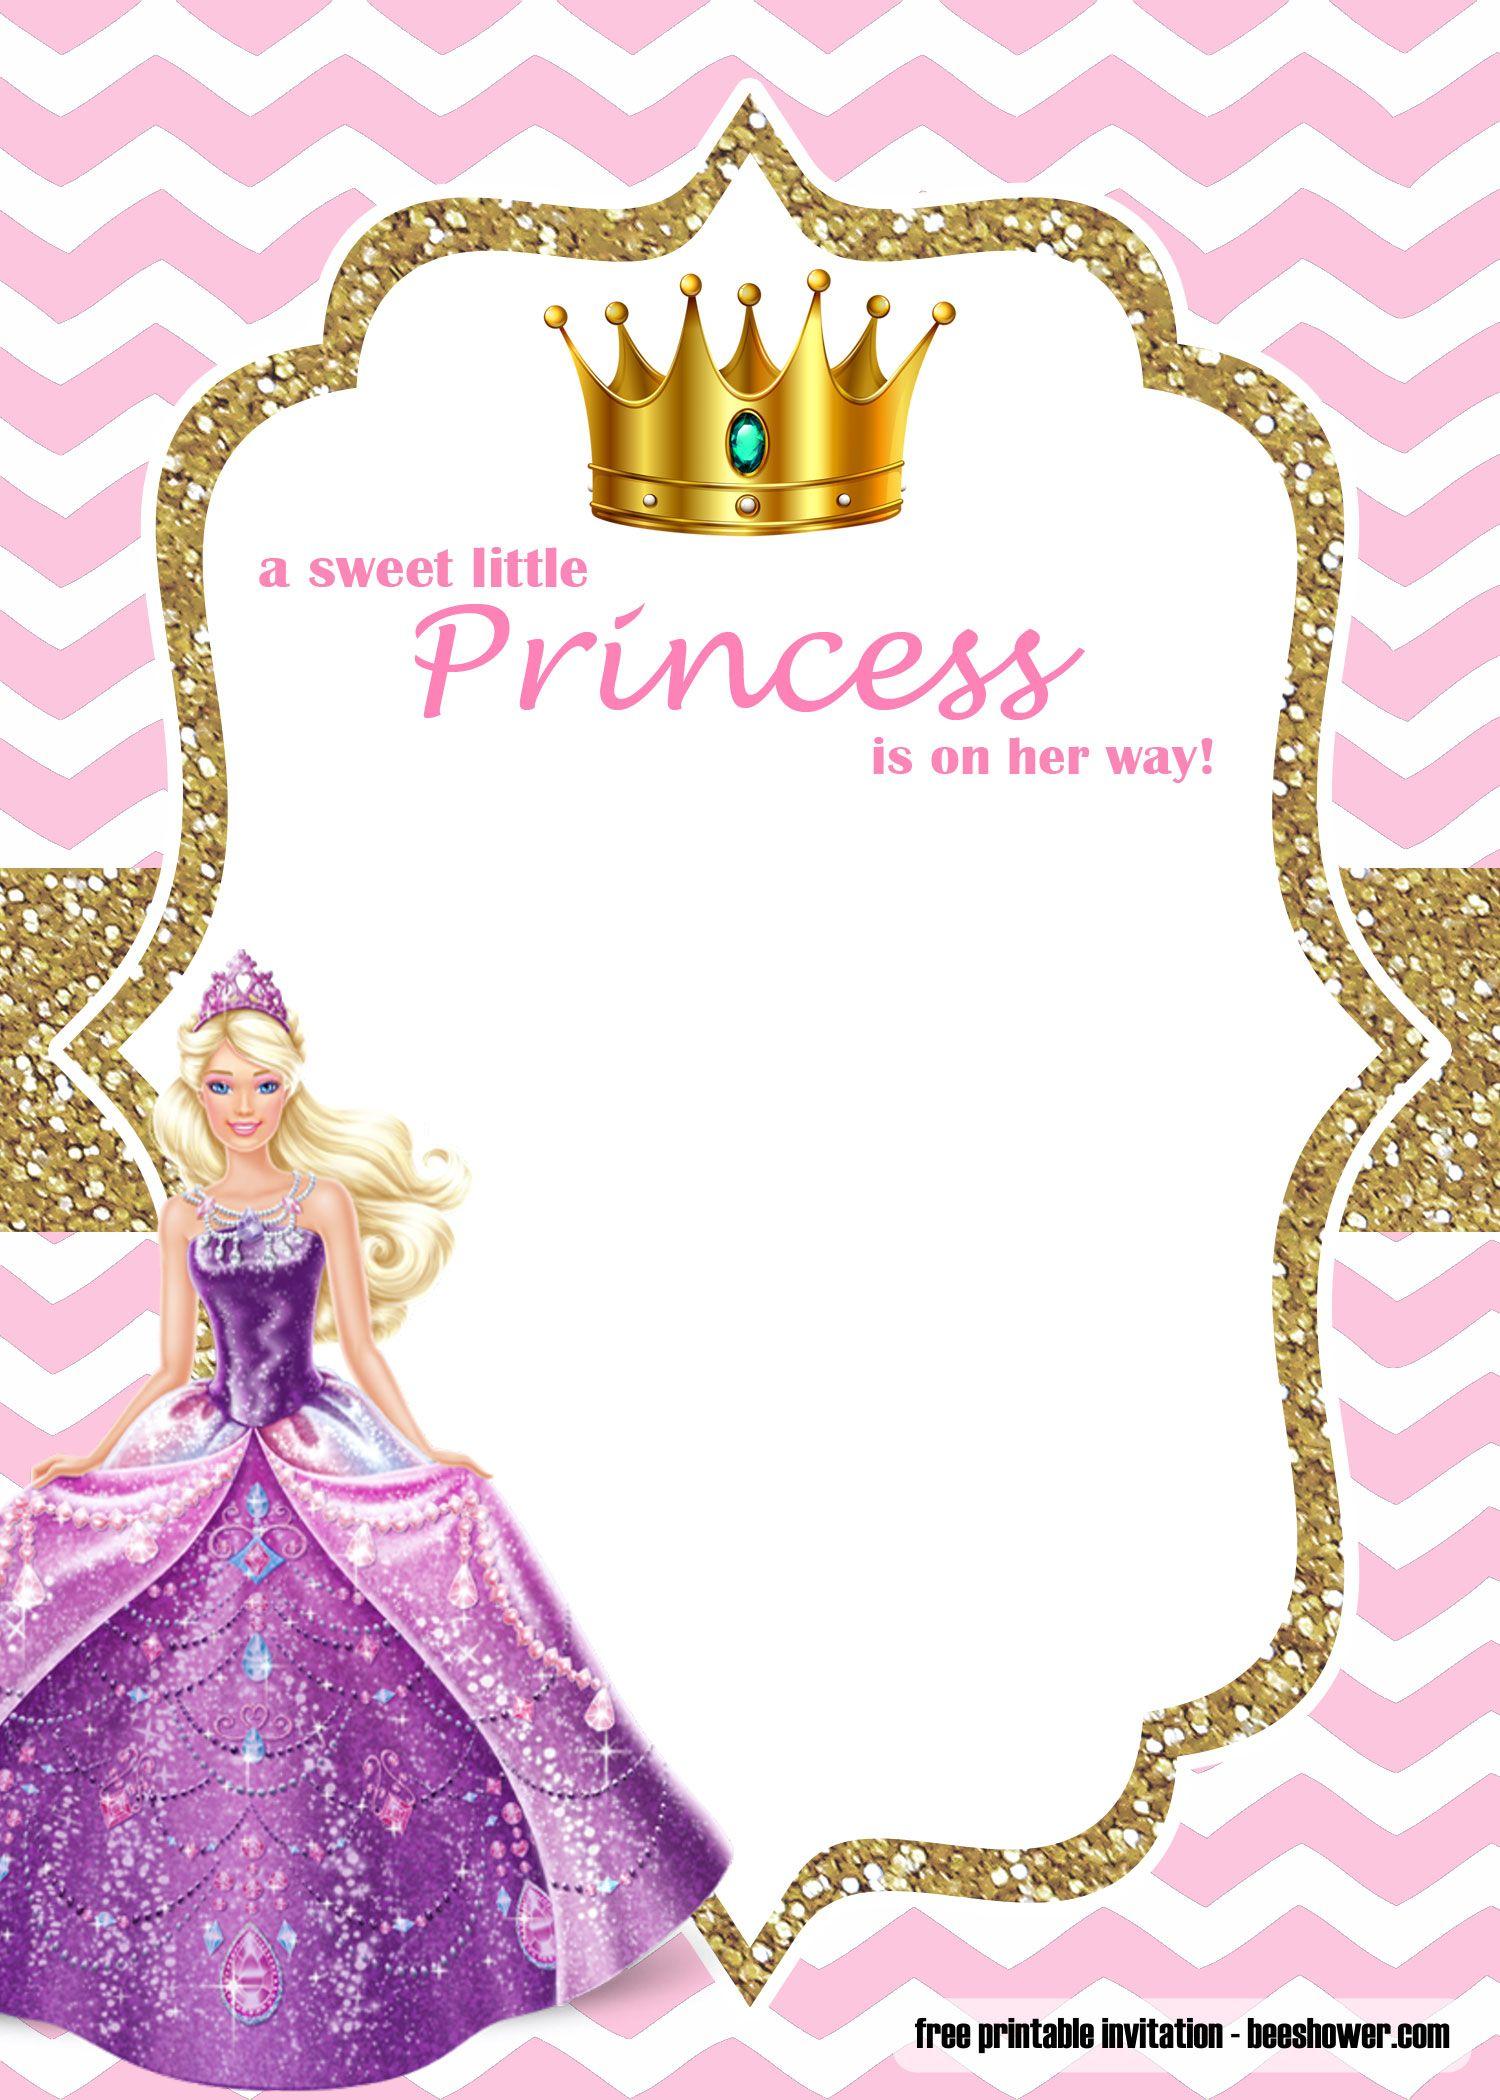 Free Princess Barbie Baby Shower Invitations Templates Disney Princess Invitations Princess Baby Shower Invitation Princess Invitations